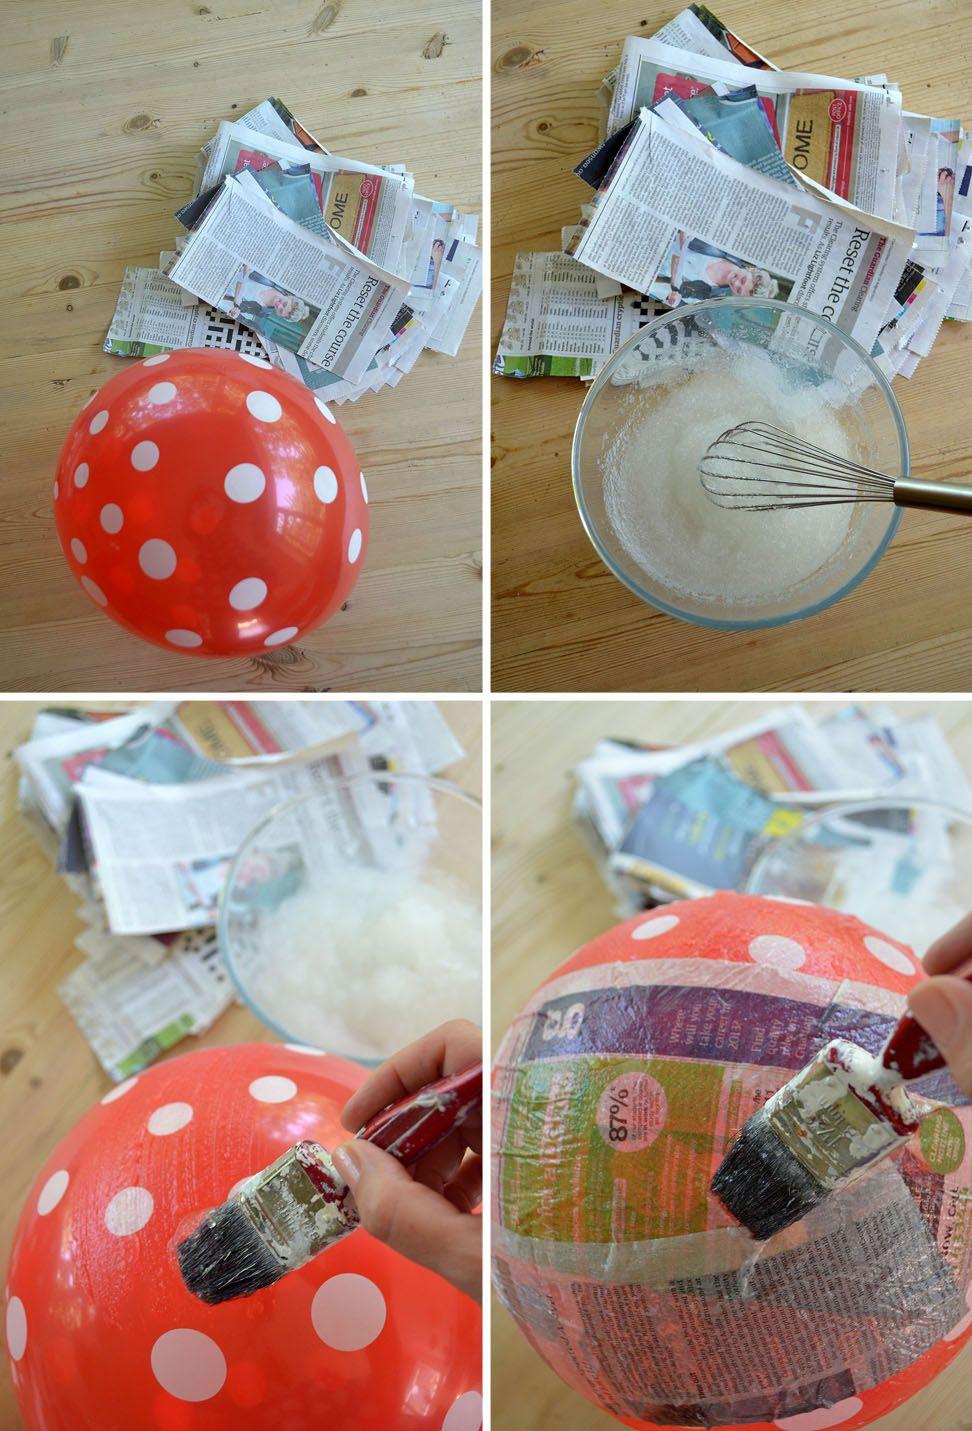 Paper Mache Japanese Style Diy Lamp Shade Ao Life Lifestyle Diy Lamp Shade Diy Lamp Painting Lamp Shades